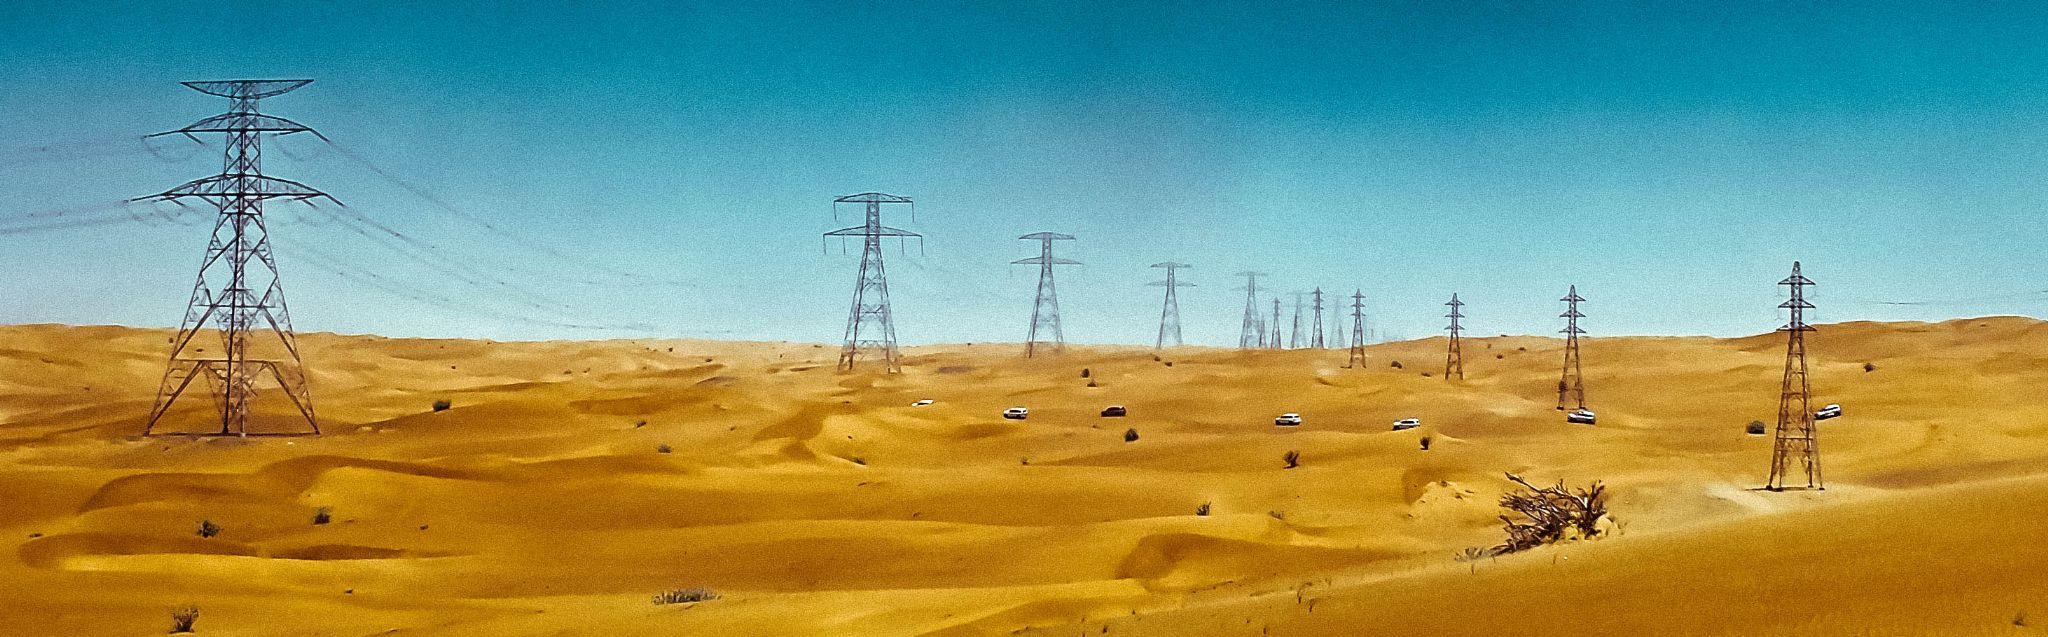 desert safari by ruel narciso bautista